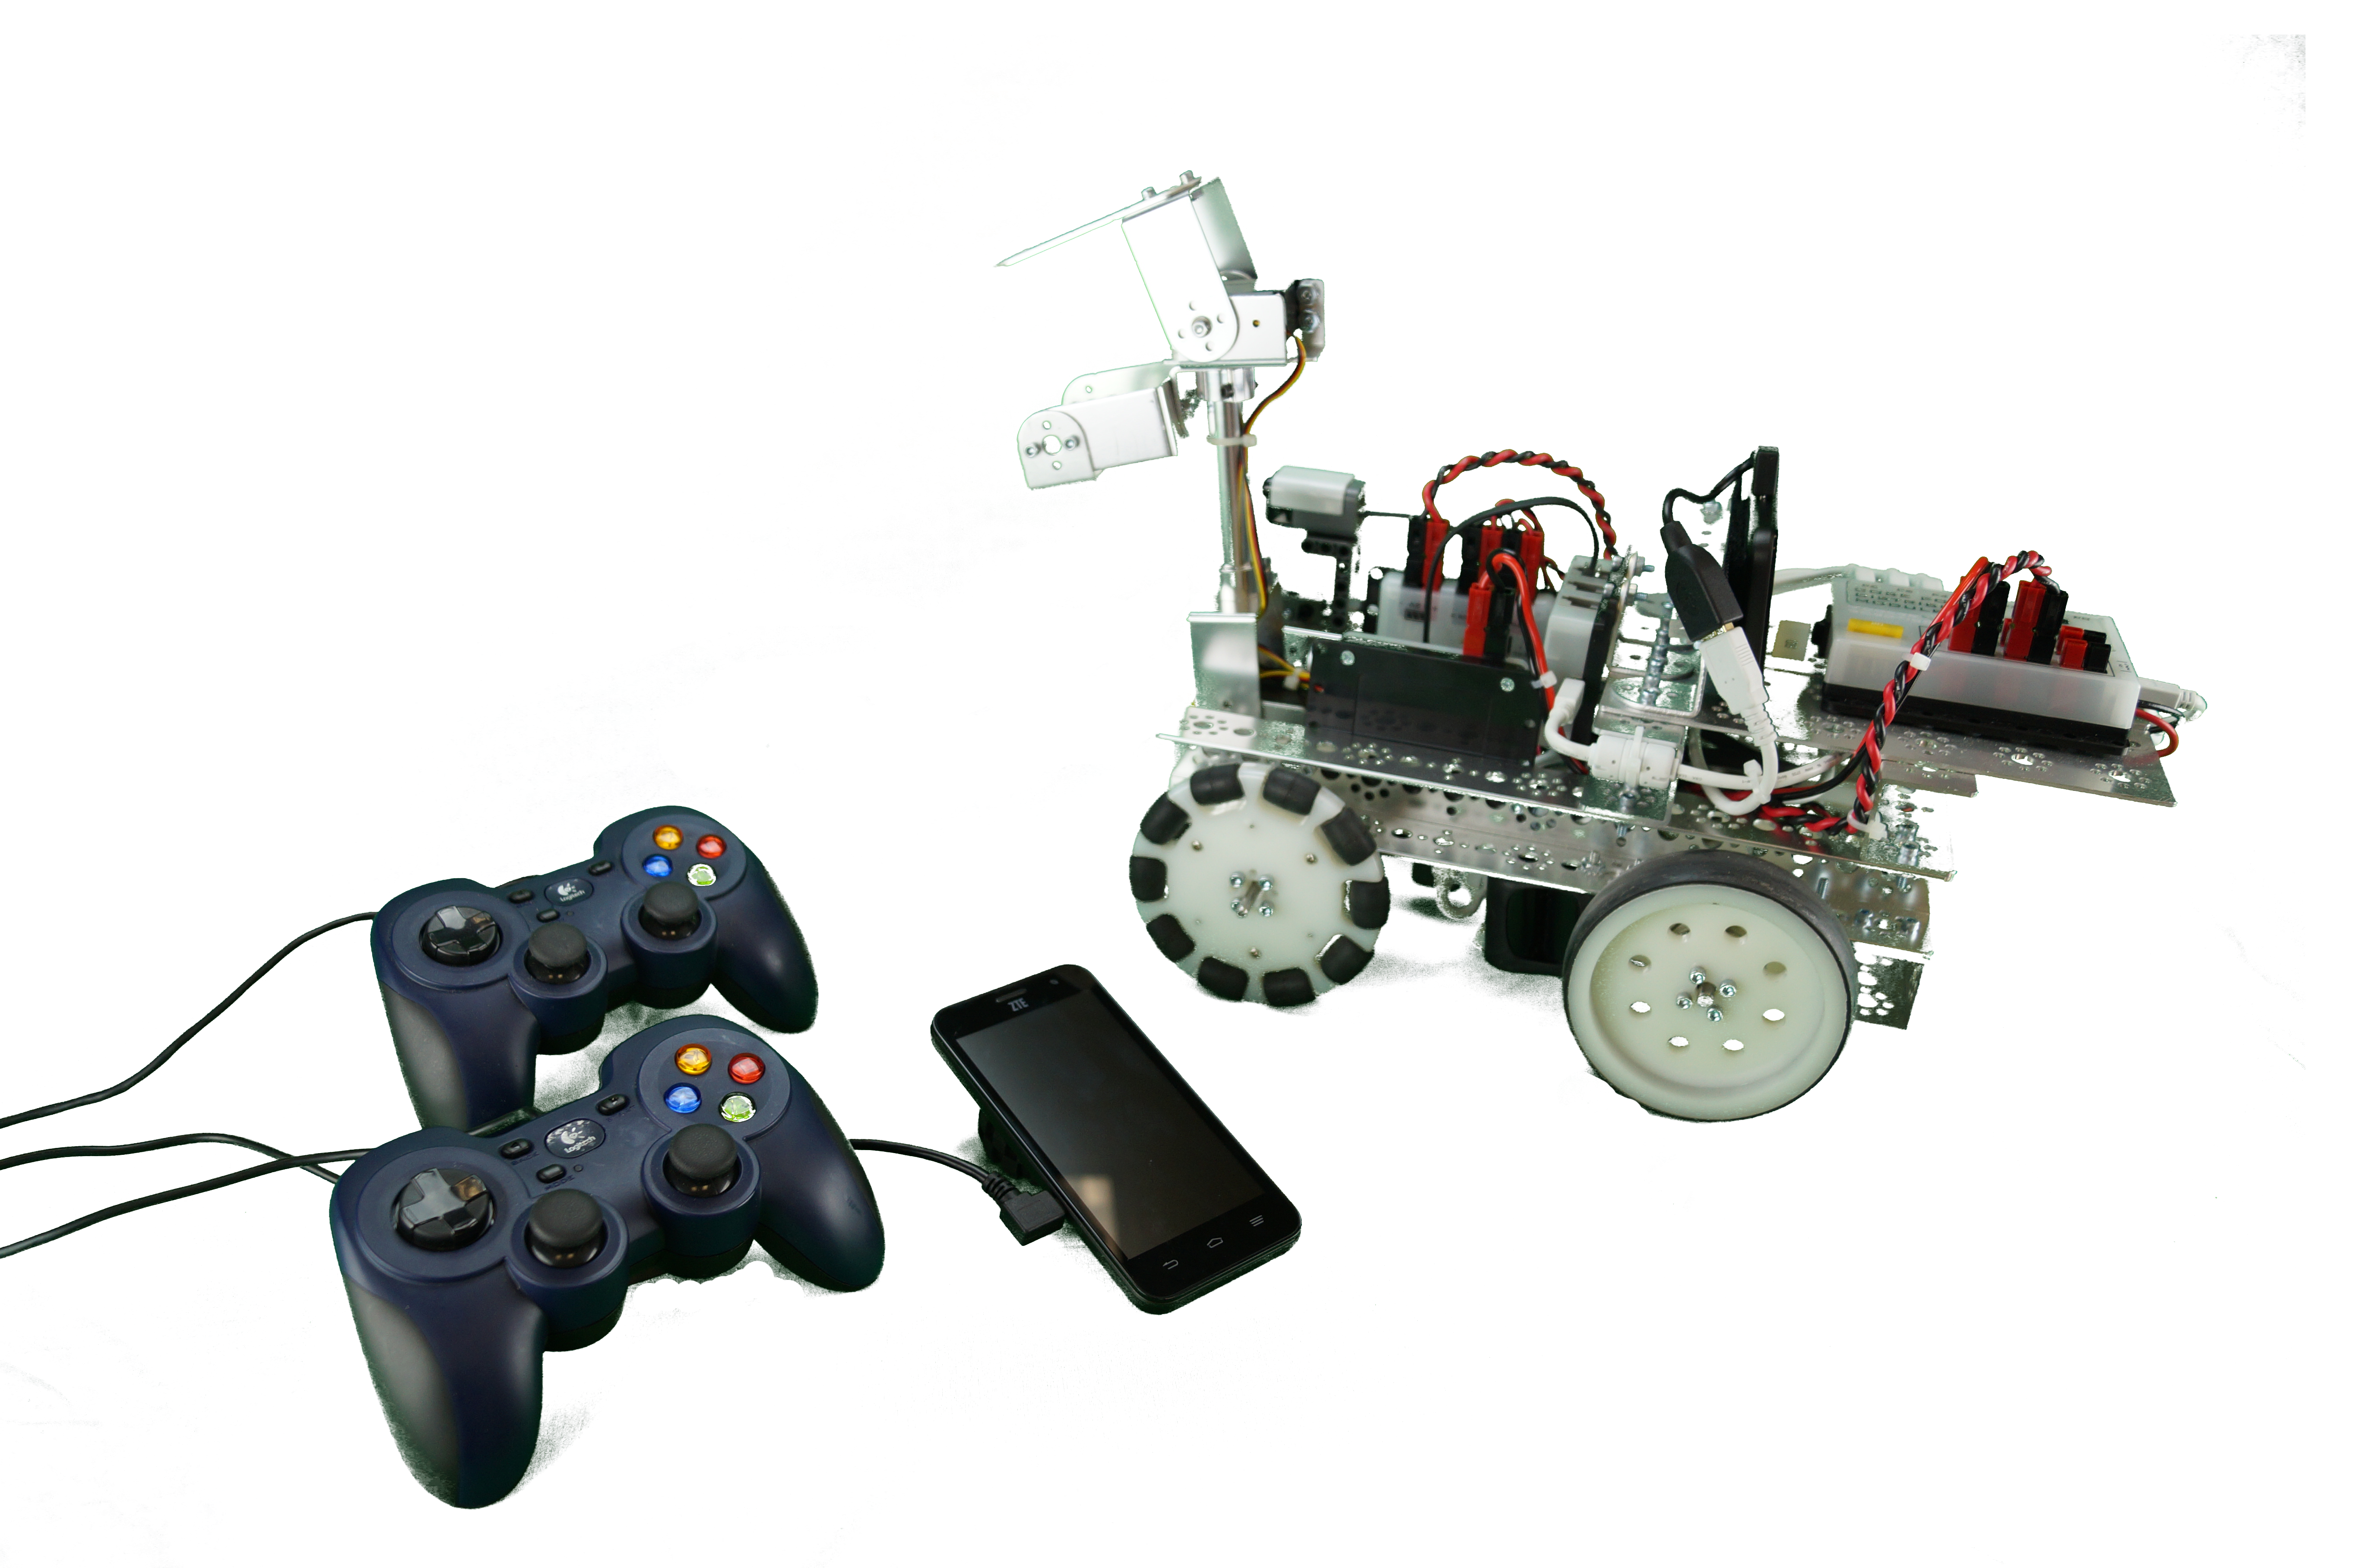 FIRST Tech Challenge Robotics Kit